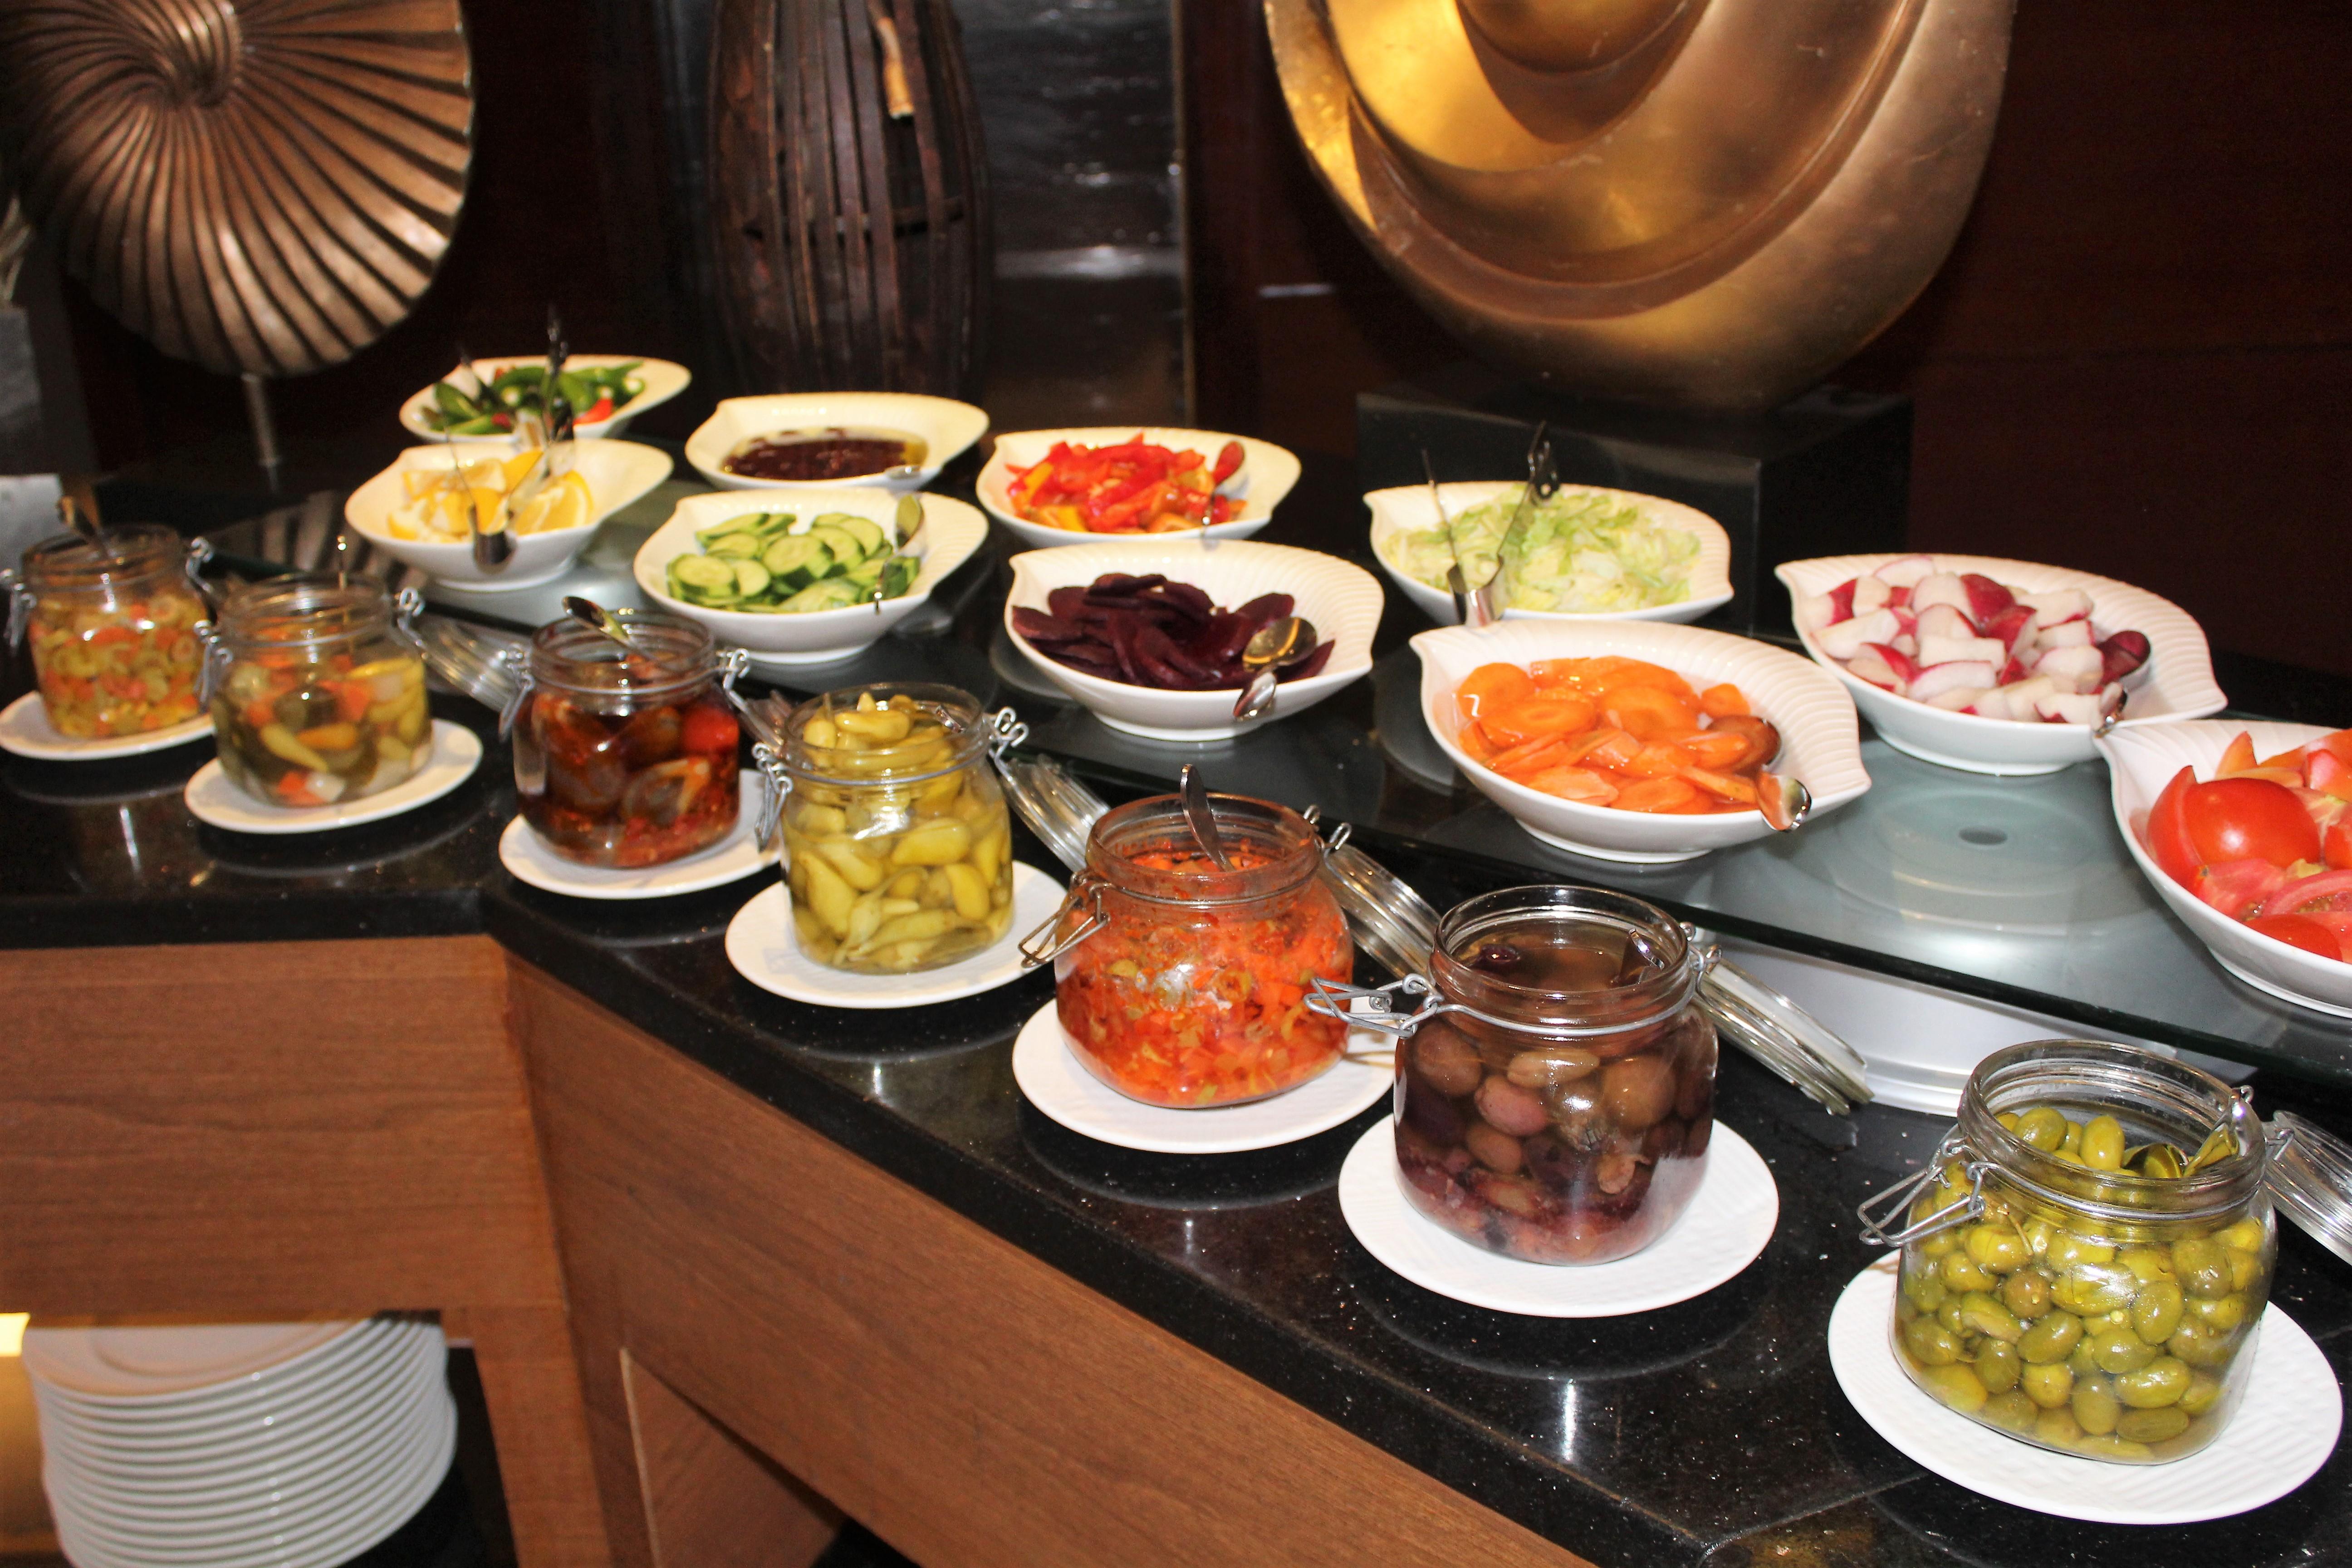 Dinner buffet at the Hilton Doubletree Aqaba Jordan.